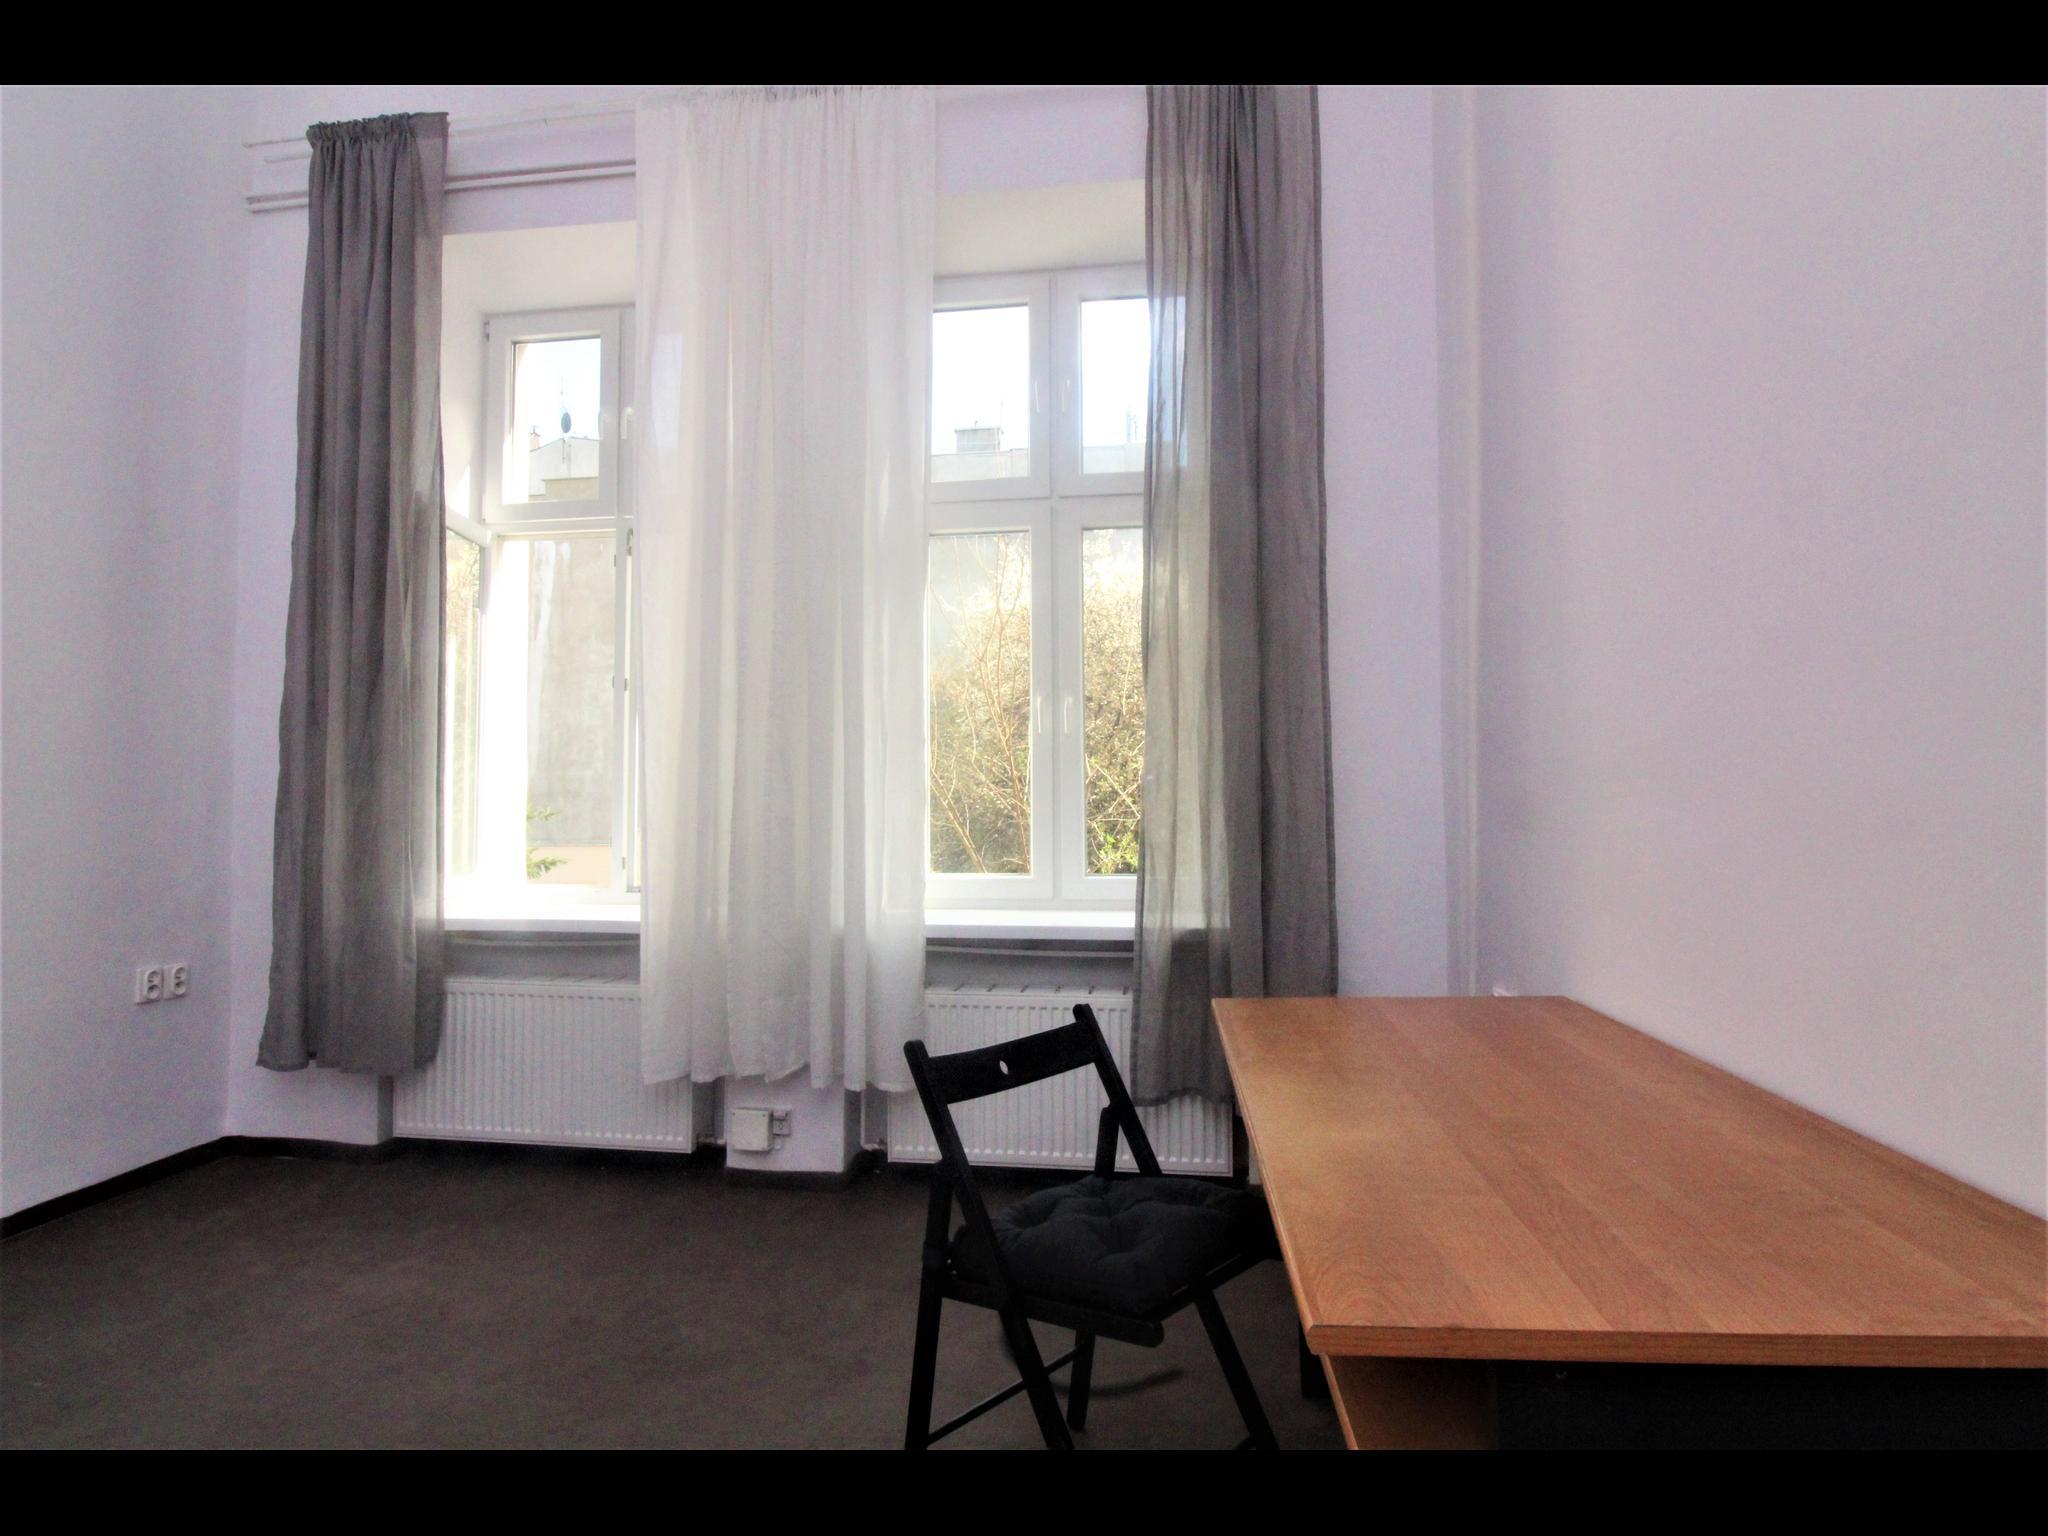 Agnieszki - 5 bedroom apartment in Krakow